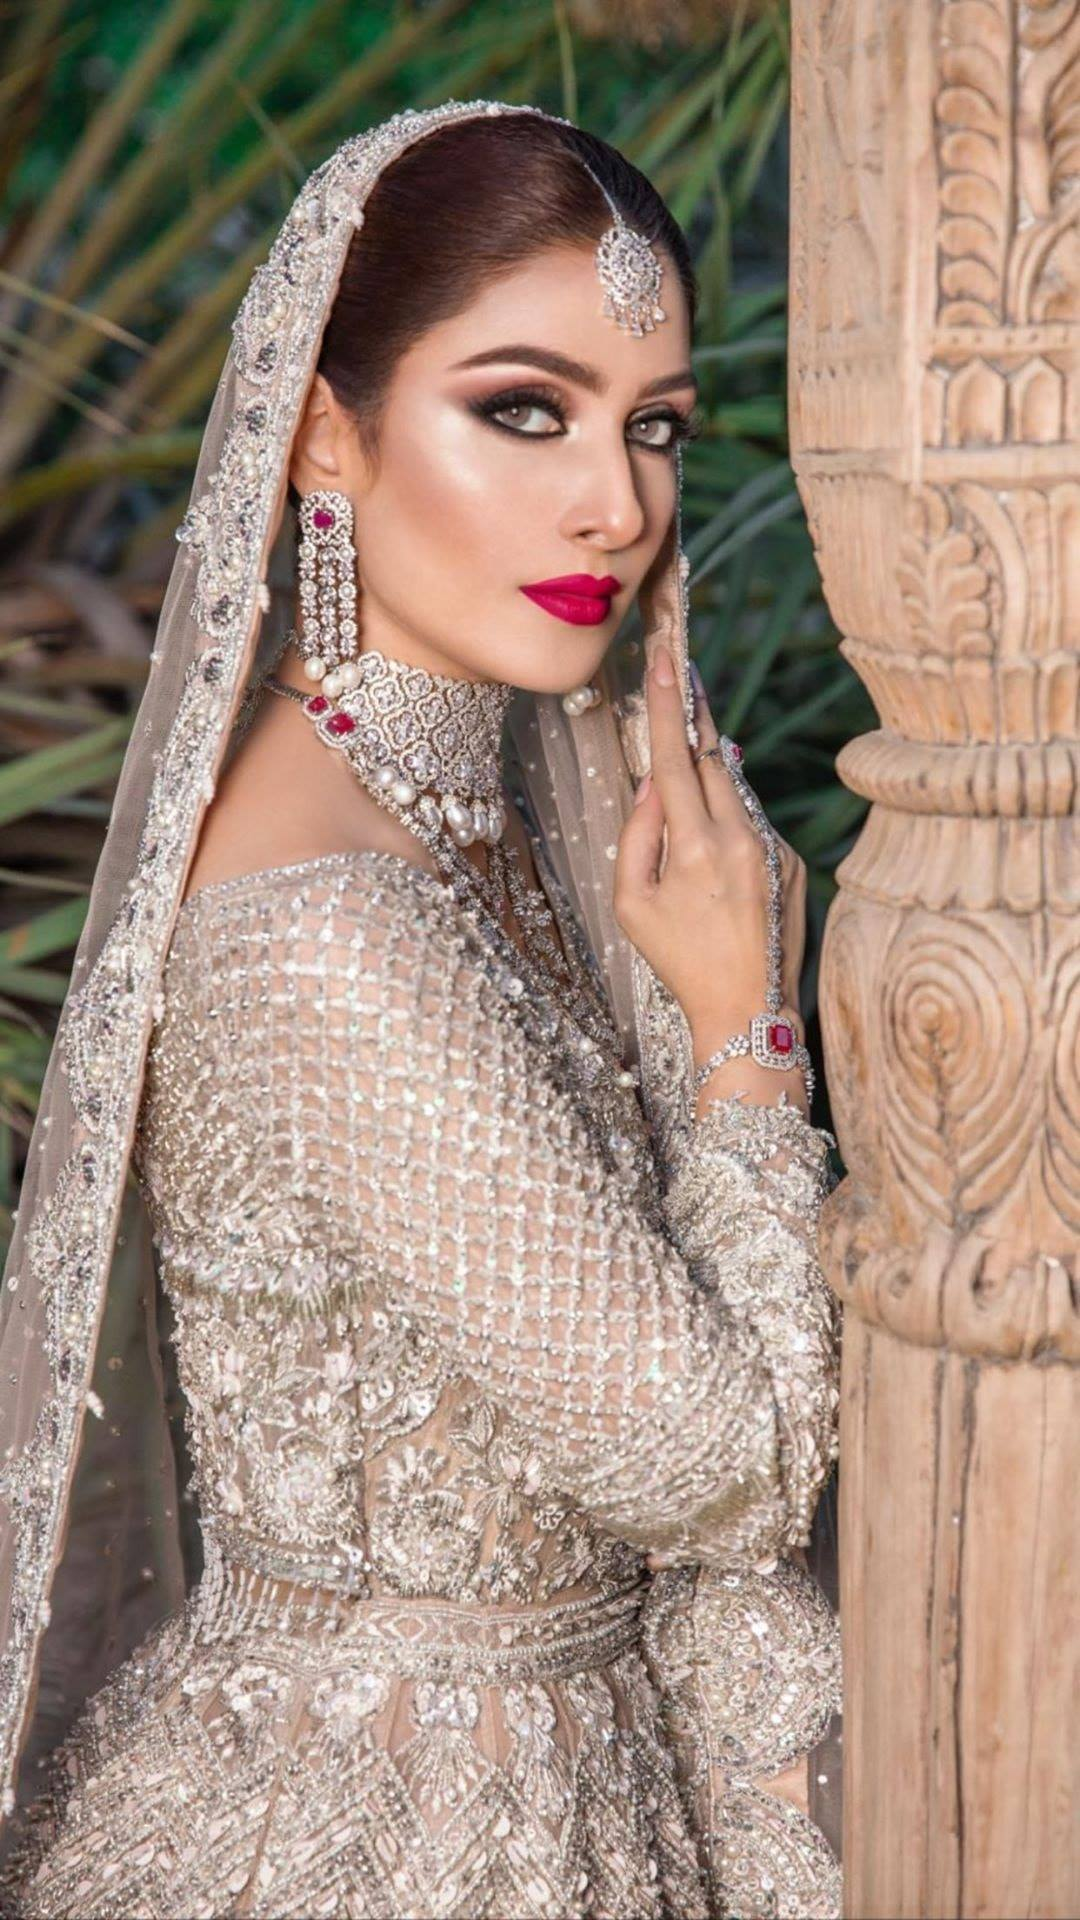 Ayeza Khan looks stunning in Latest Bridal Shoot